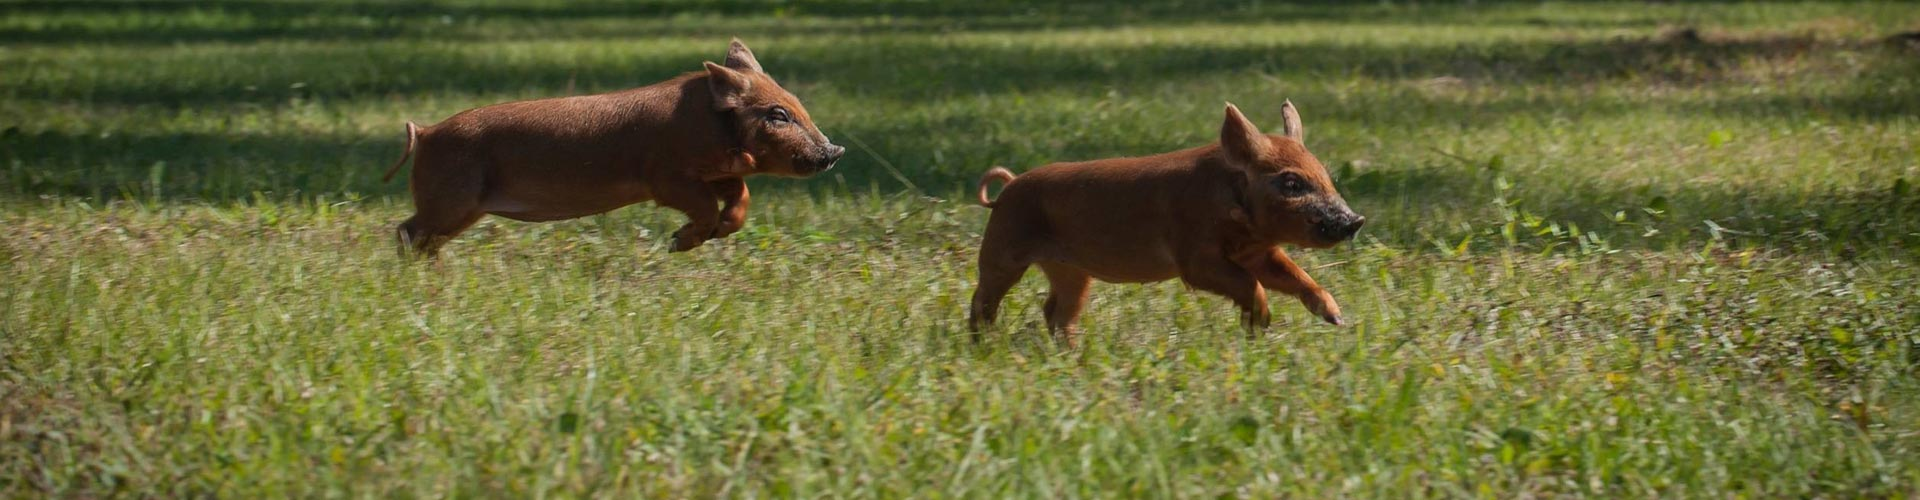 Red wattle piglets running